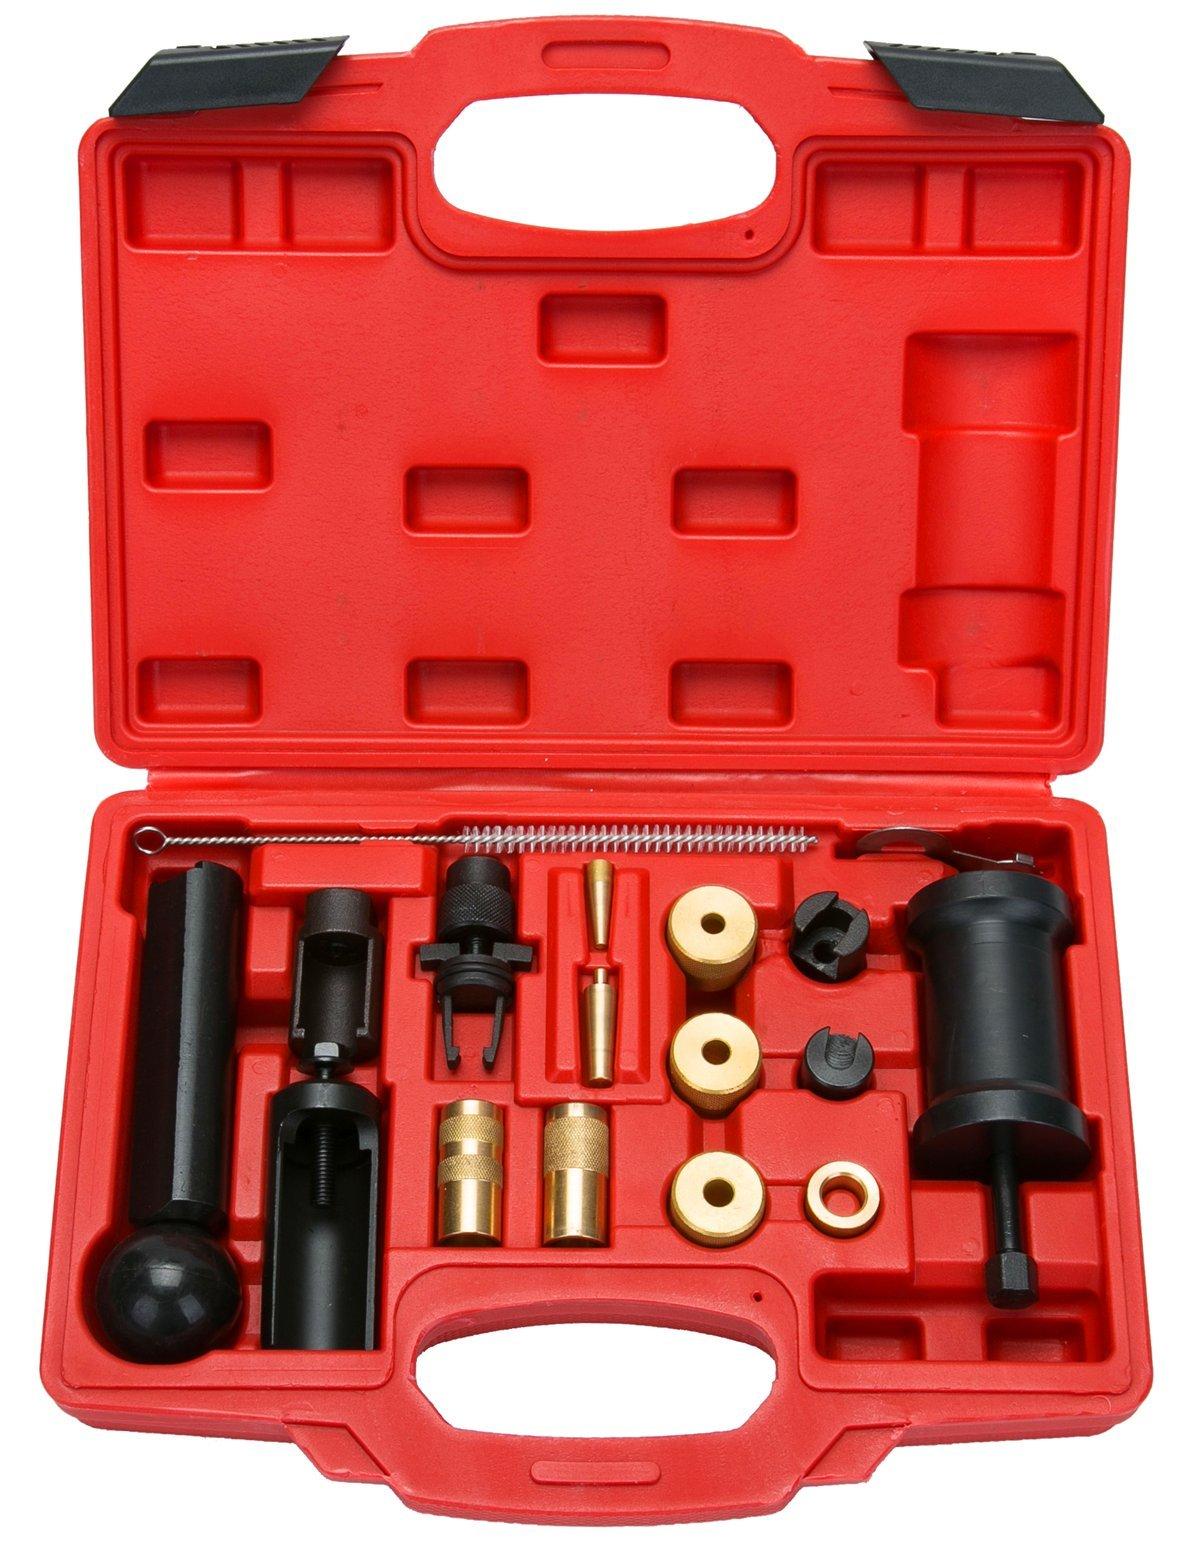 8milelake 18pcs Injector Remover Puller Set VAG VW Car Repair Garage Installer Tools Kit